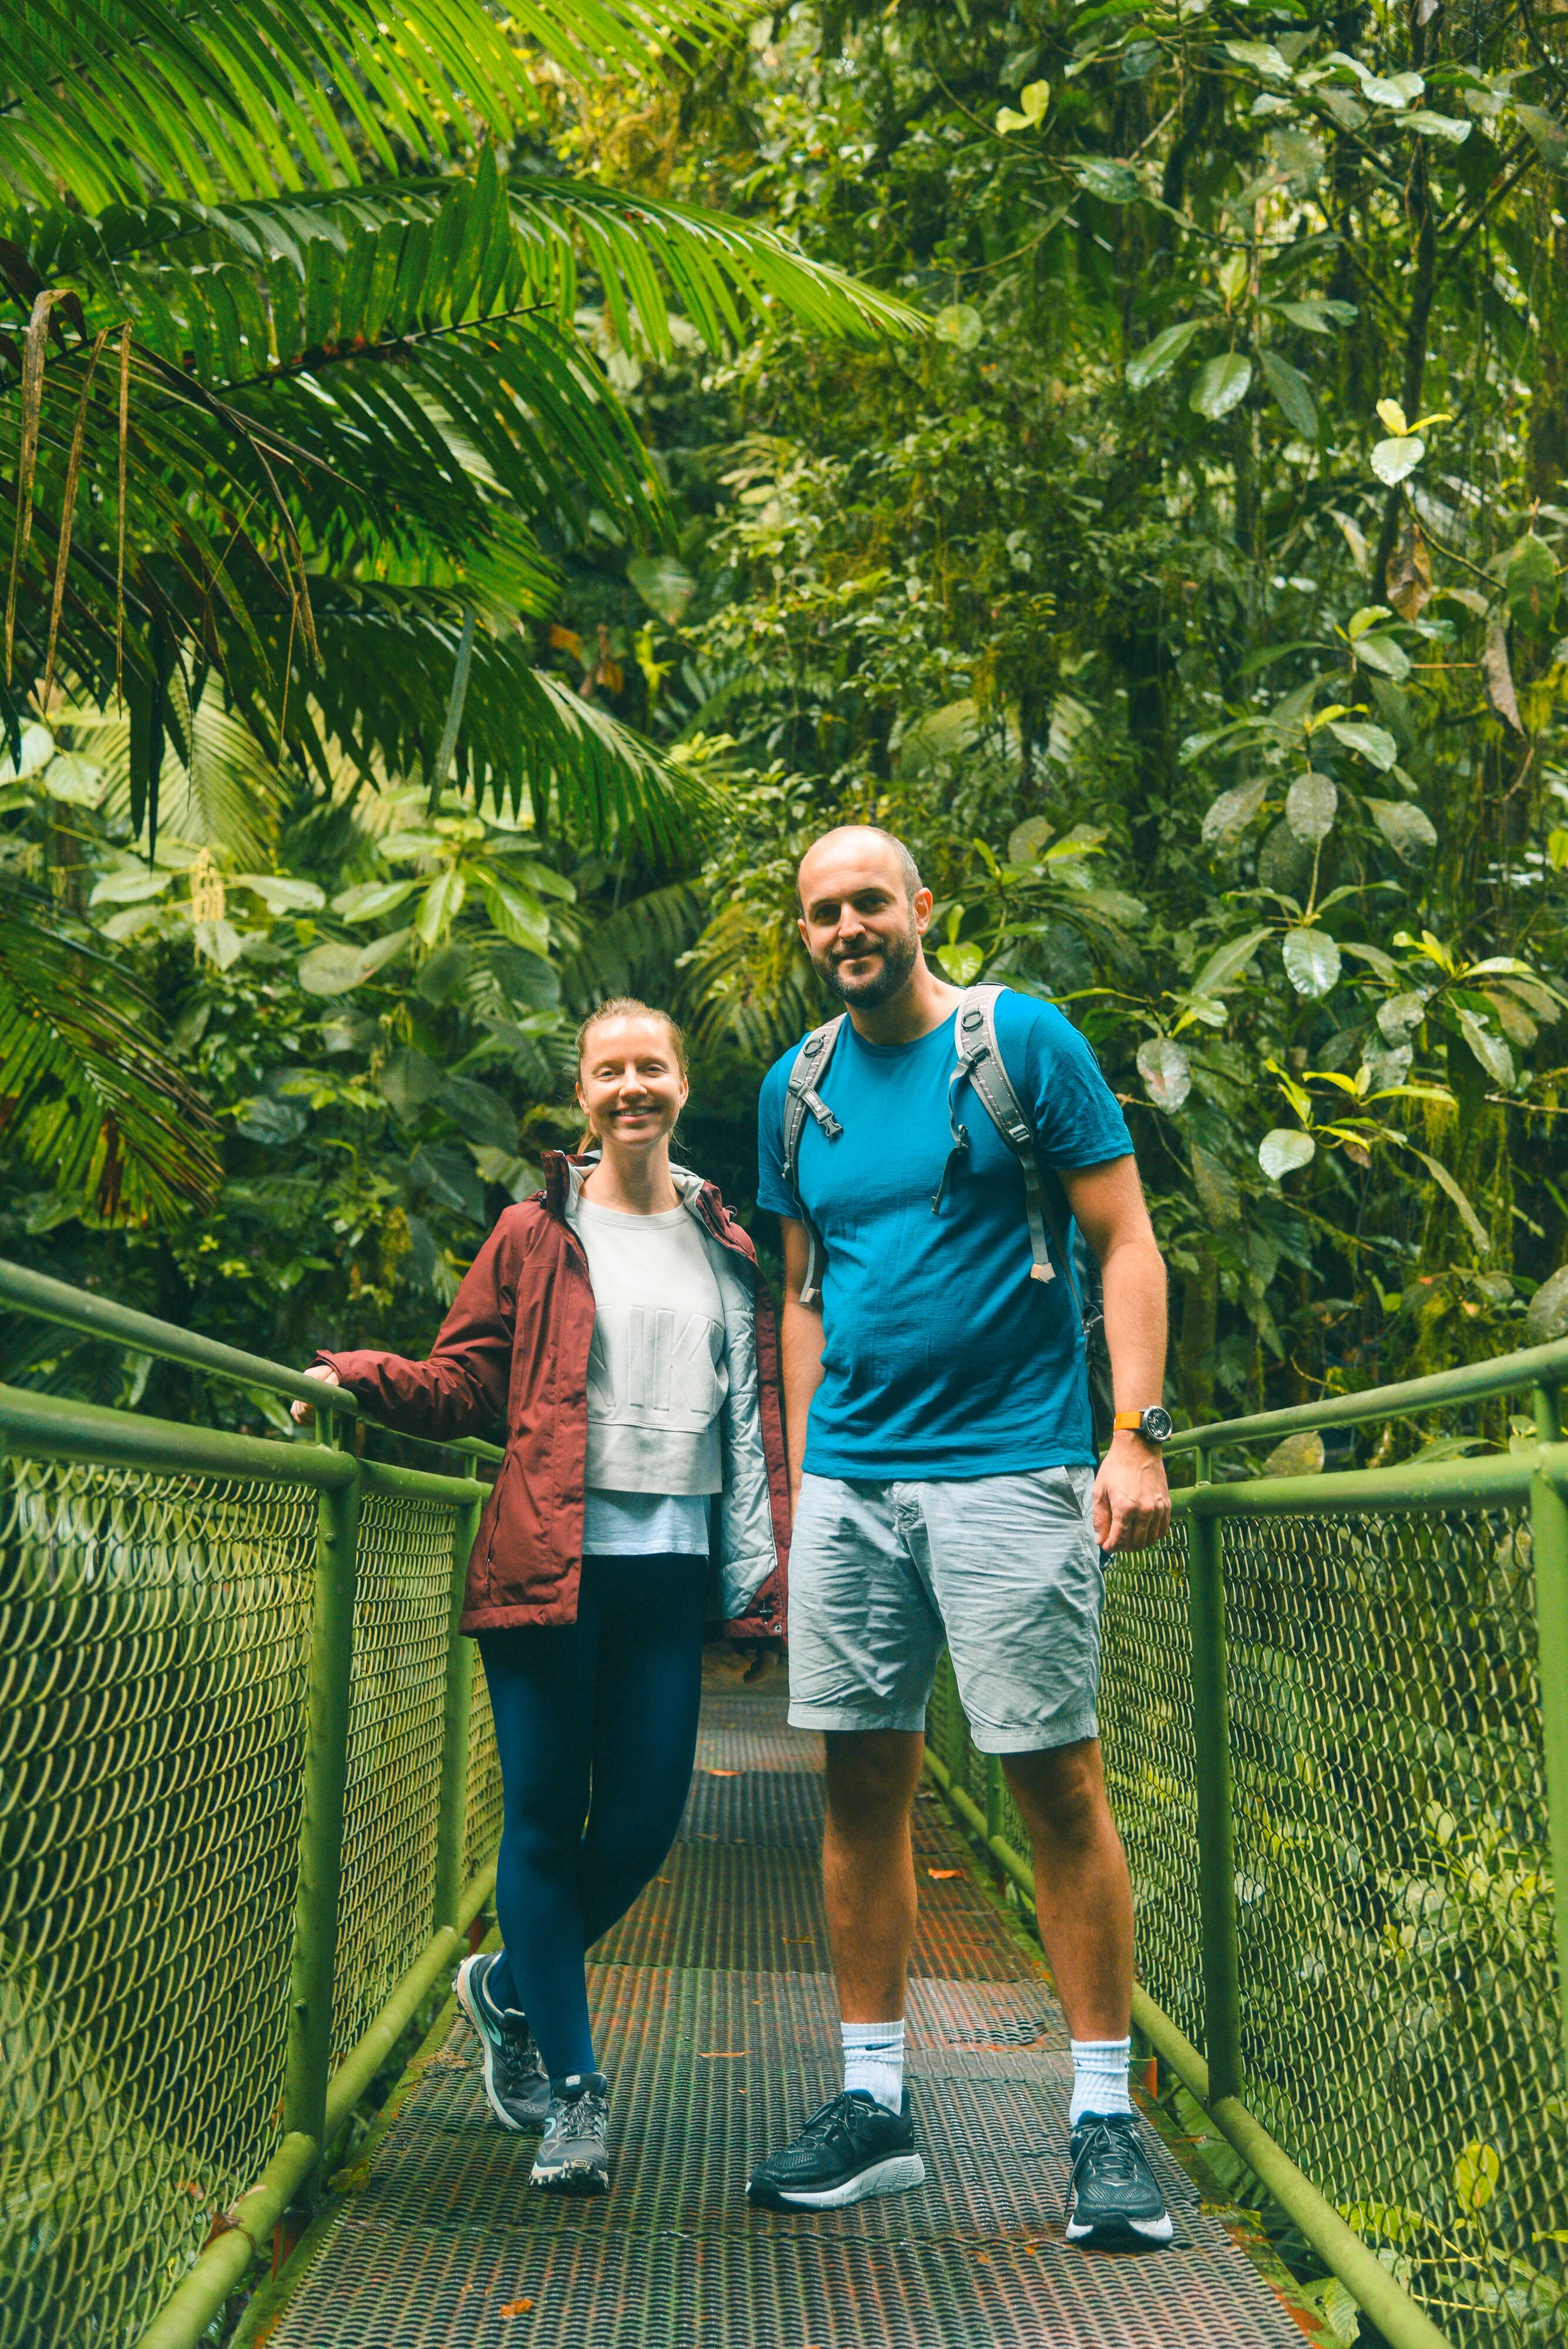 Appreciate wildlife with Desafio as you cross 15 different suspension bridges in Costa Rica!